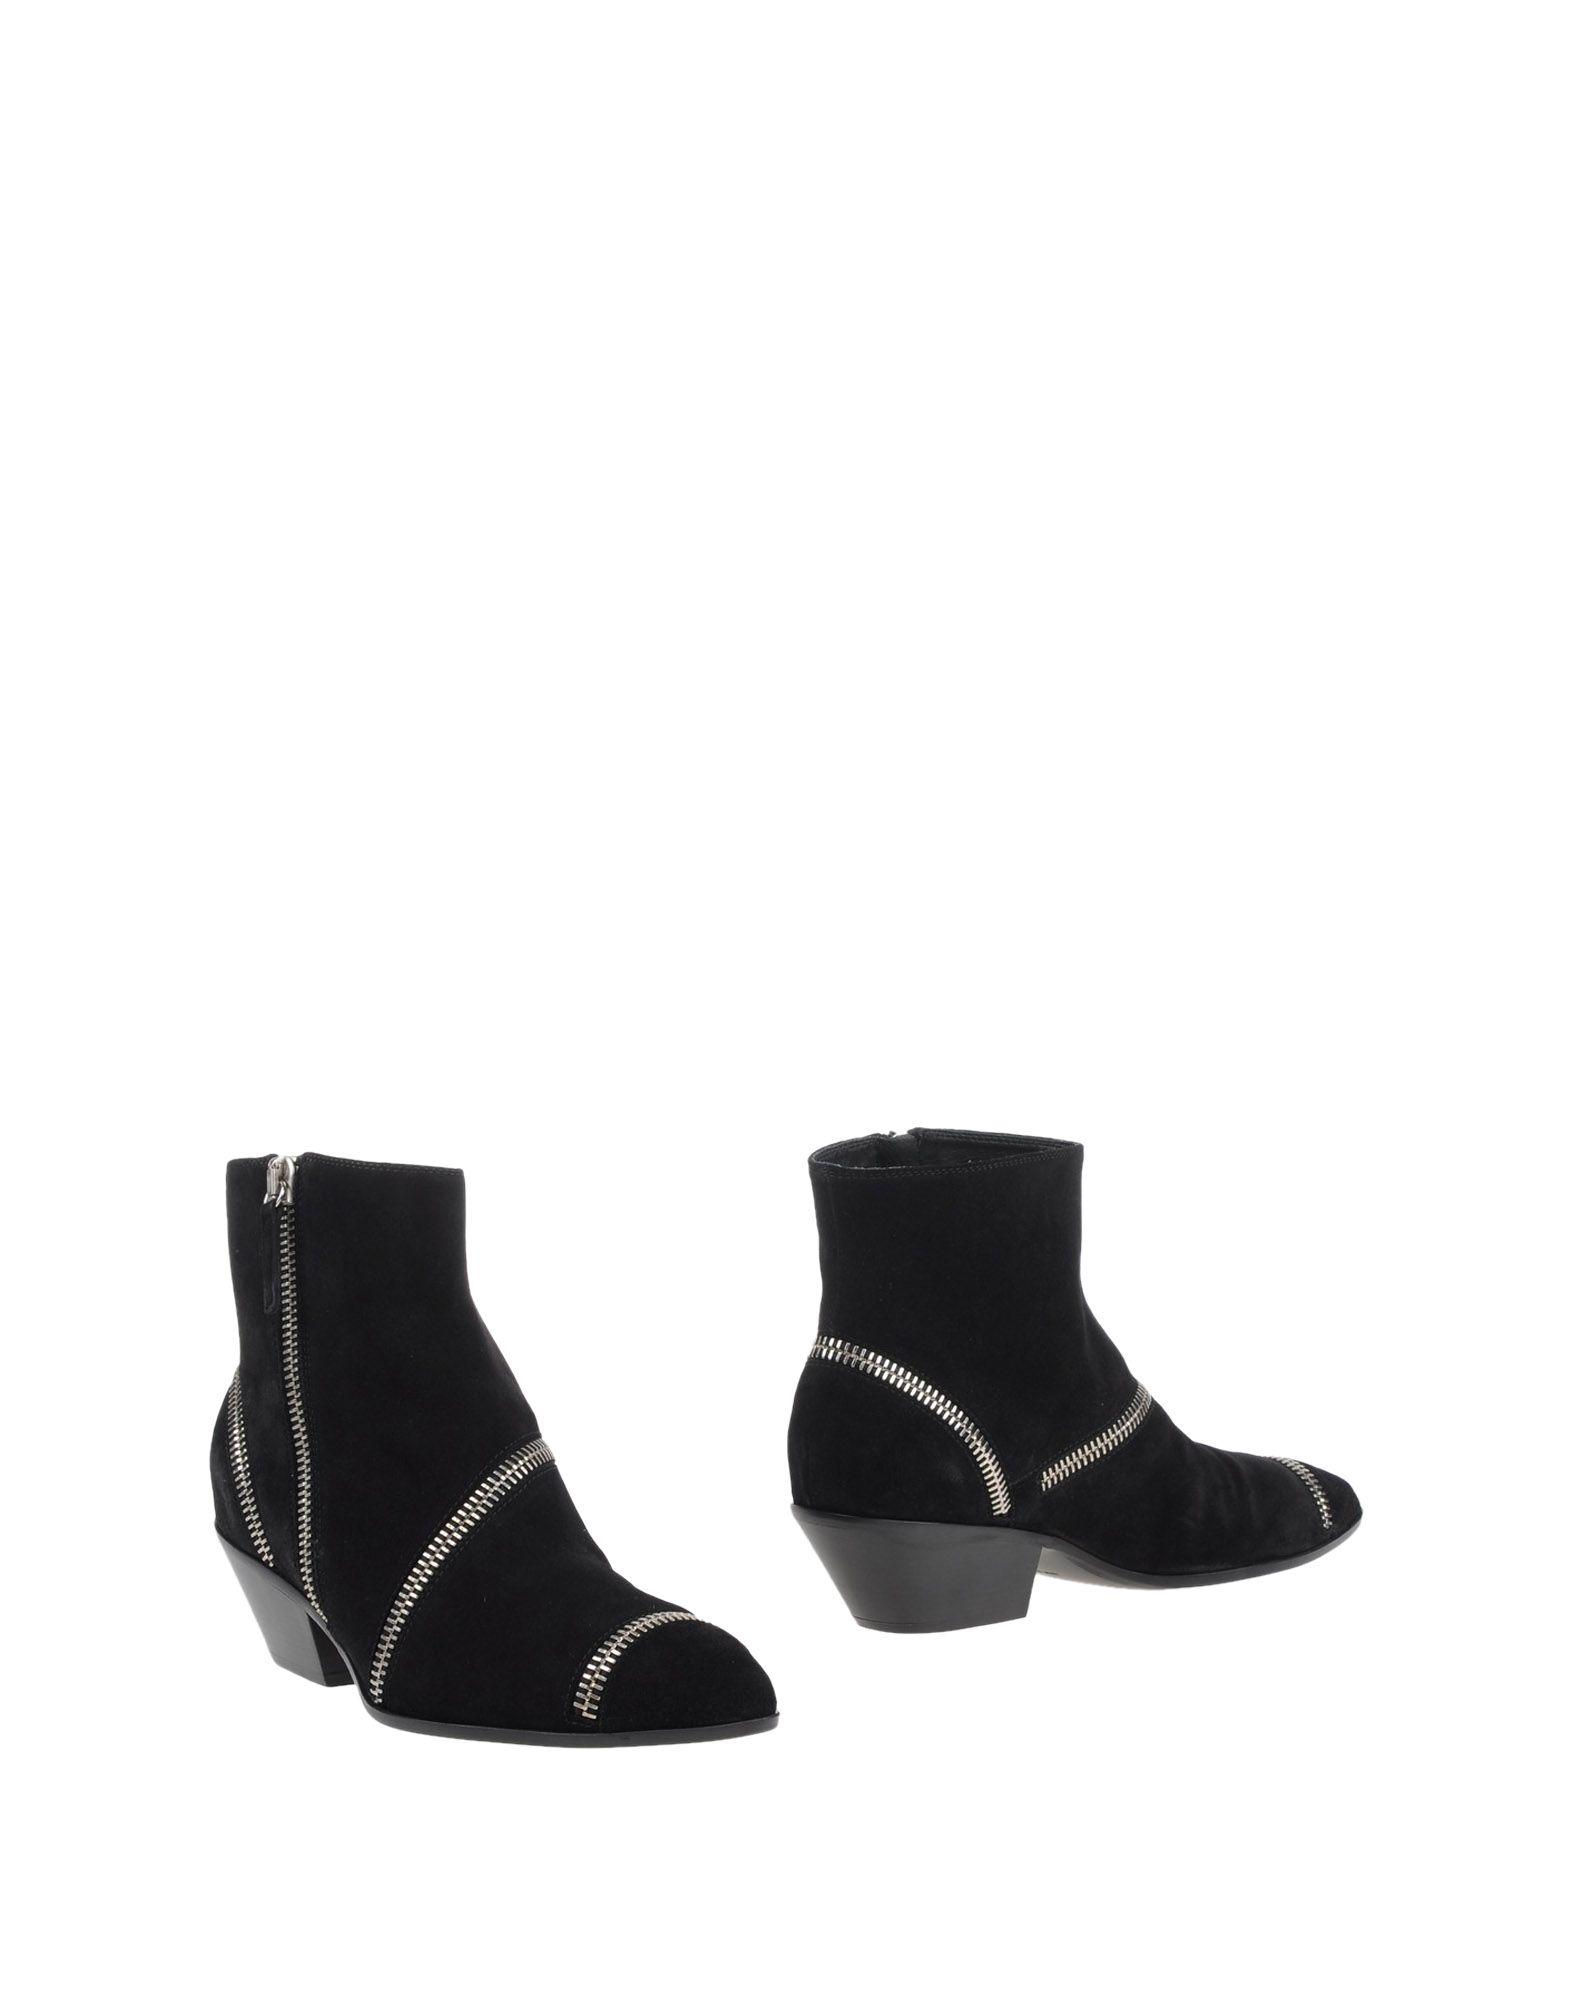 Giuseppe Zanotti Boots - - - Men Giuseppe Zanotti Boots online on  Australia - 11012780NV f8667b